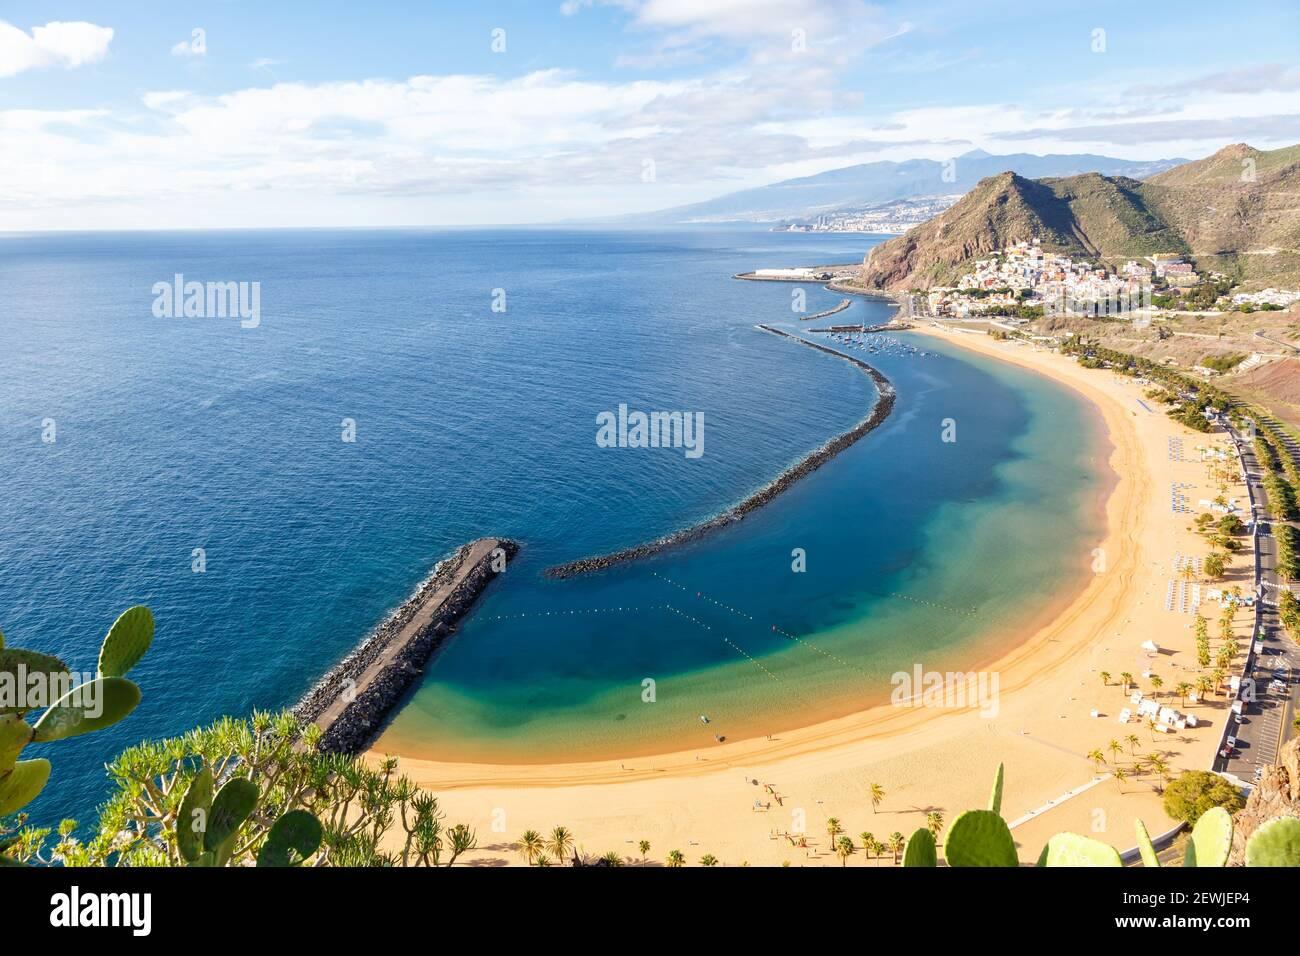 Kanarische Inseln Teneriffa Strand Teresitas Meer Reisen Atlantischer Ozean Natur. Stockfoto